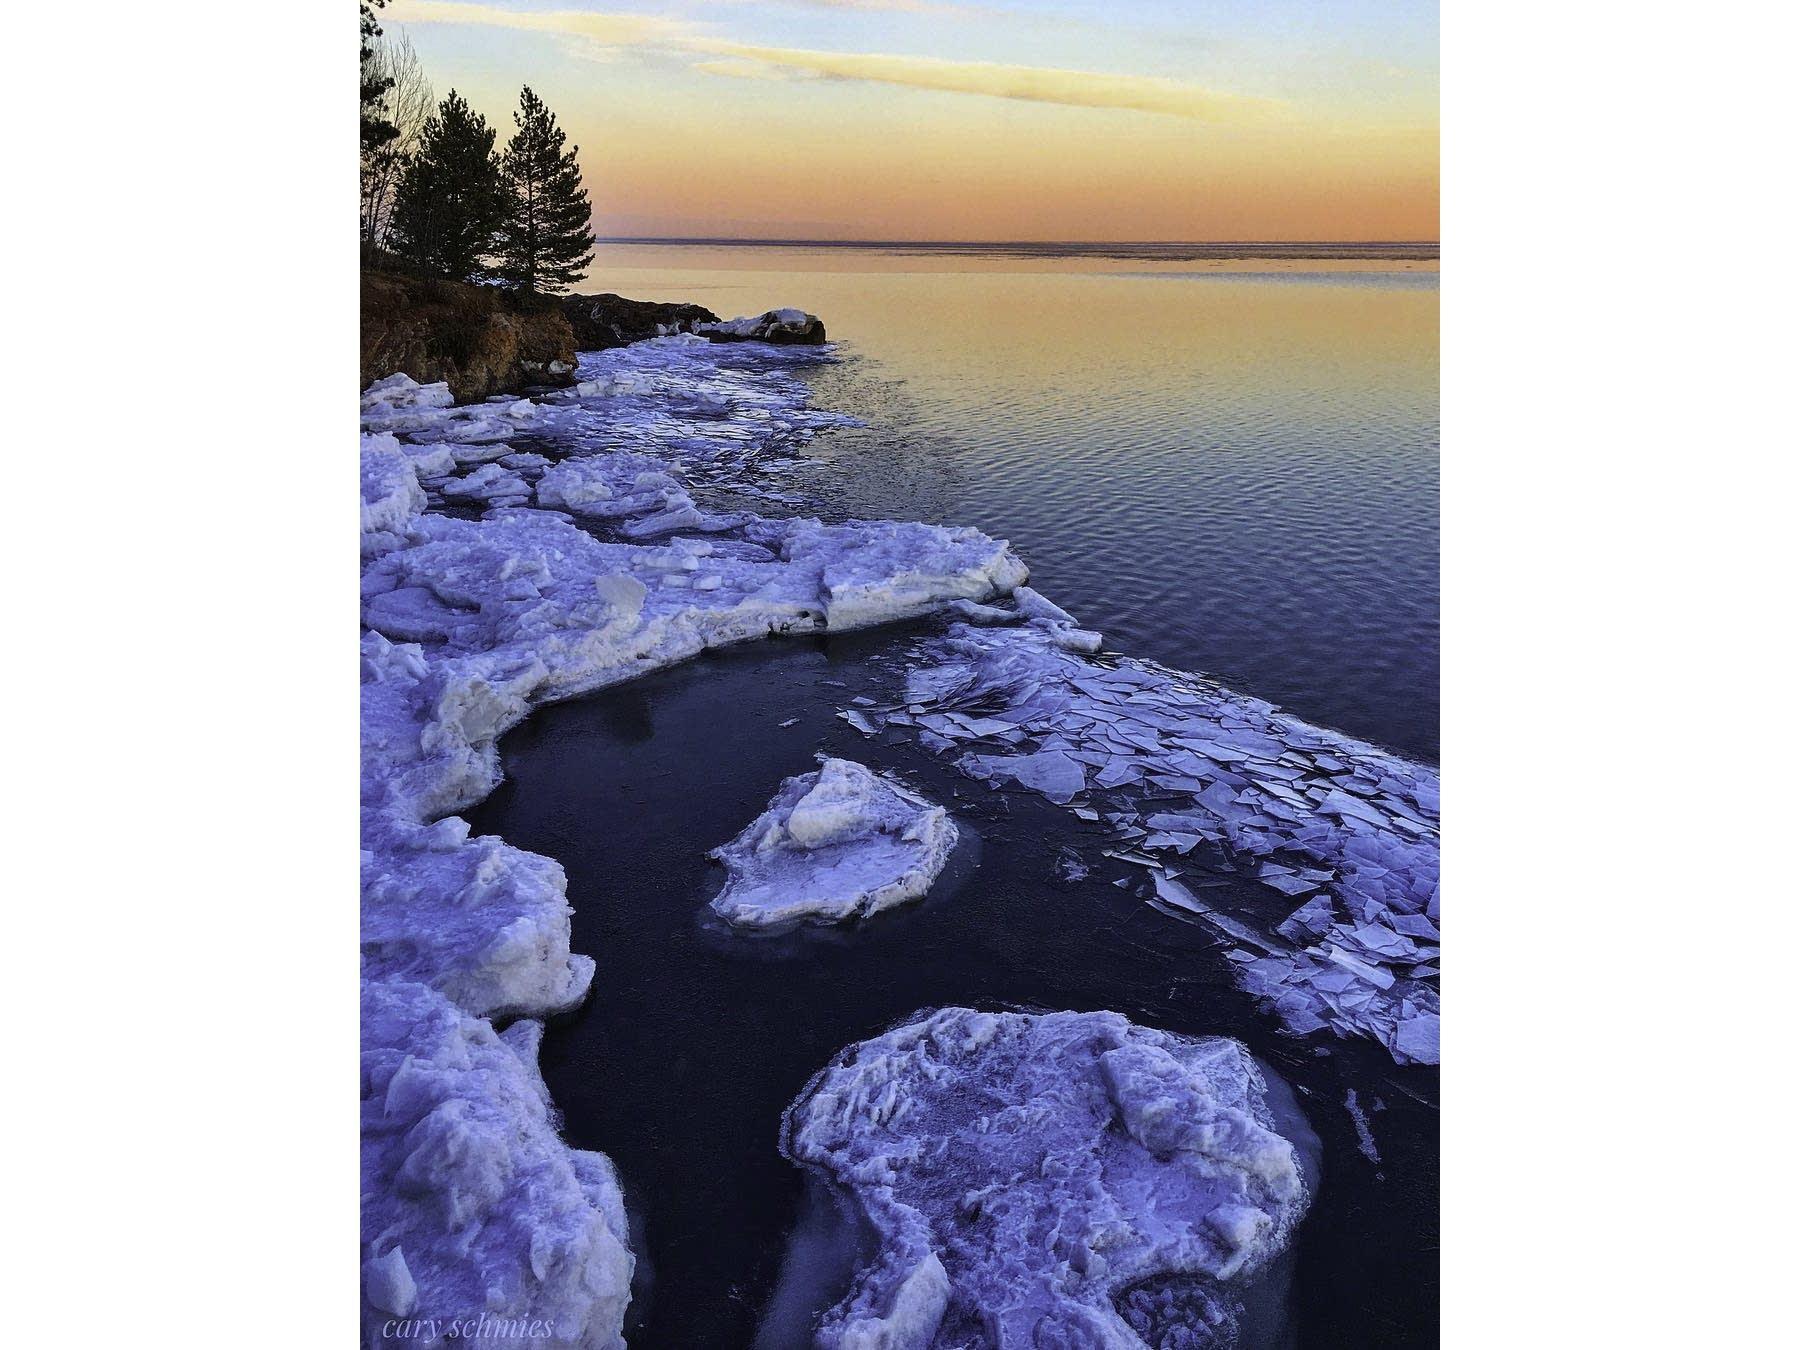 Winter's grip is loosening on Lake Superior.